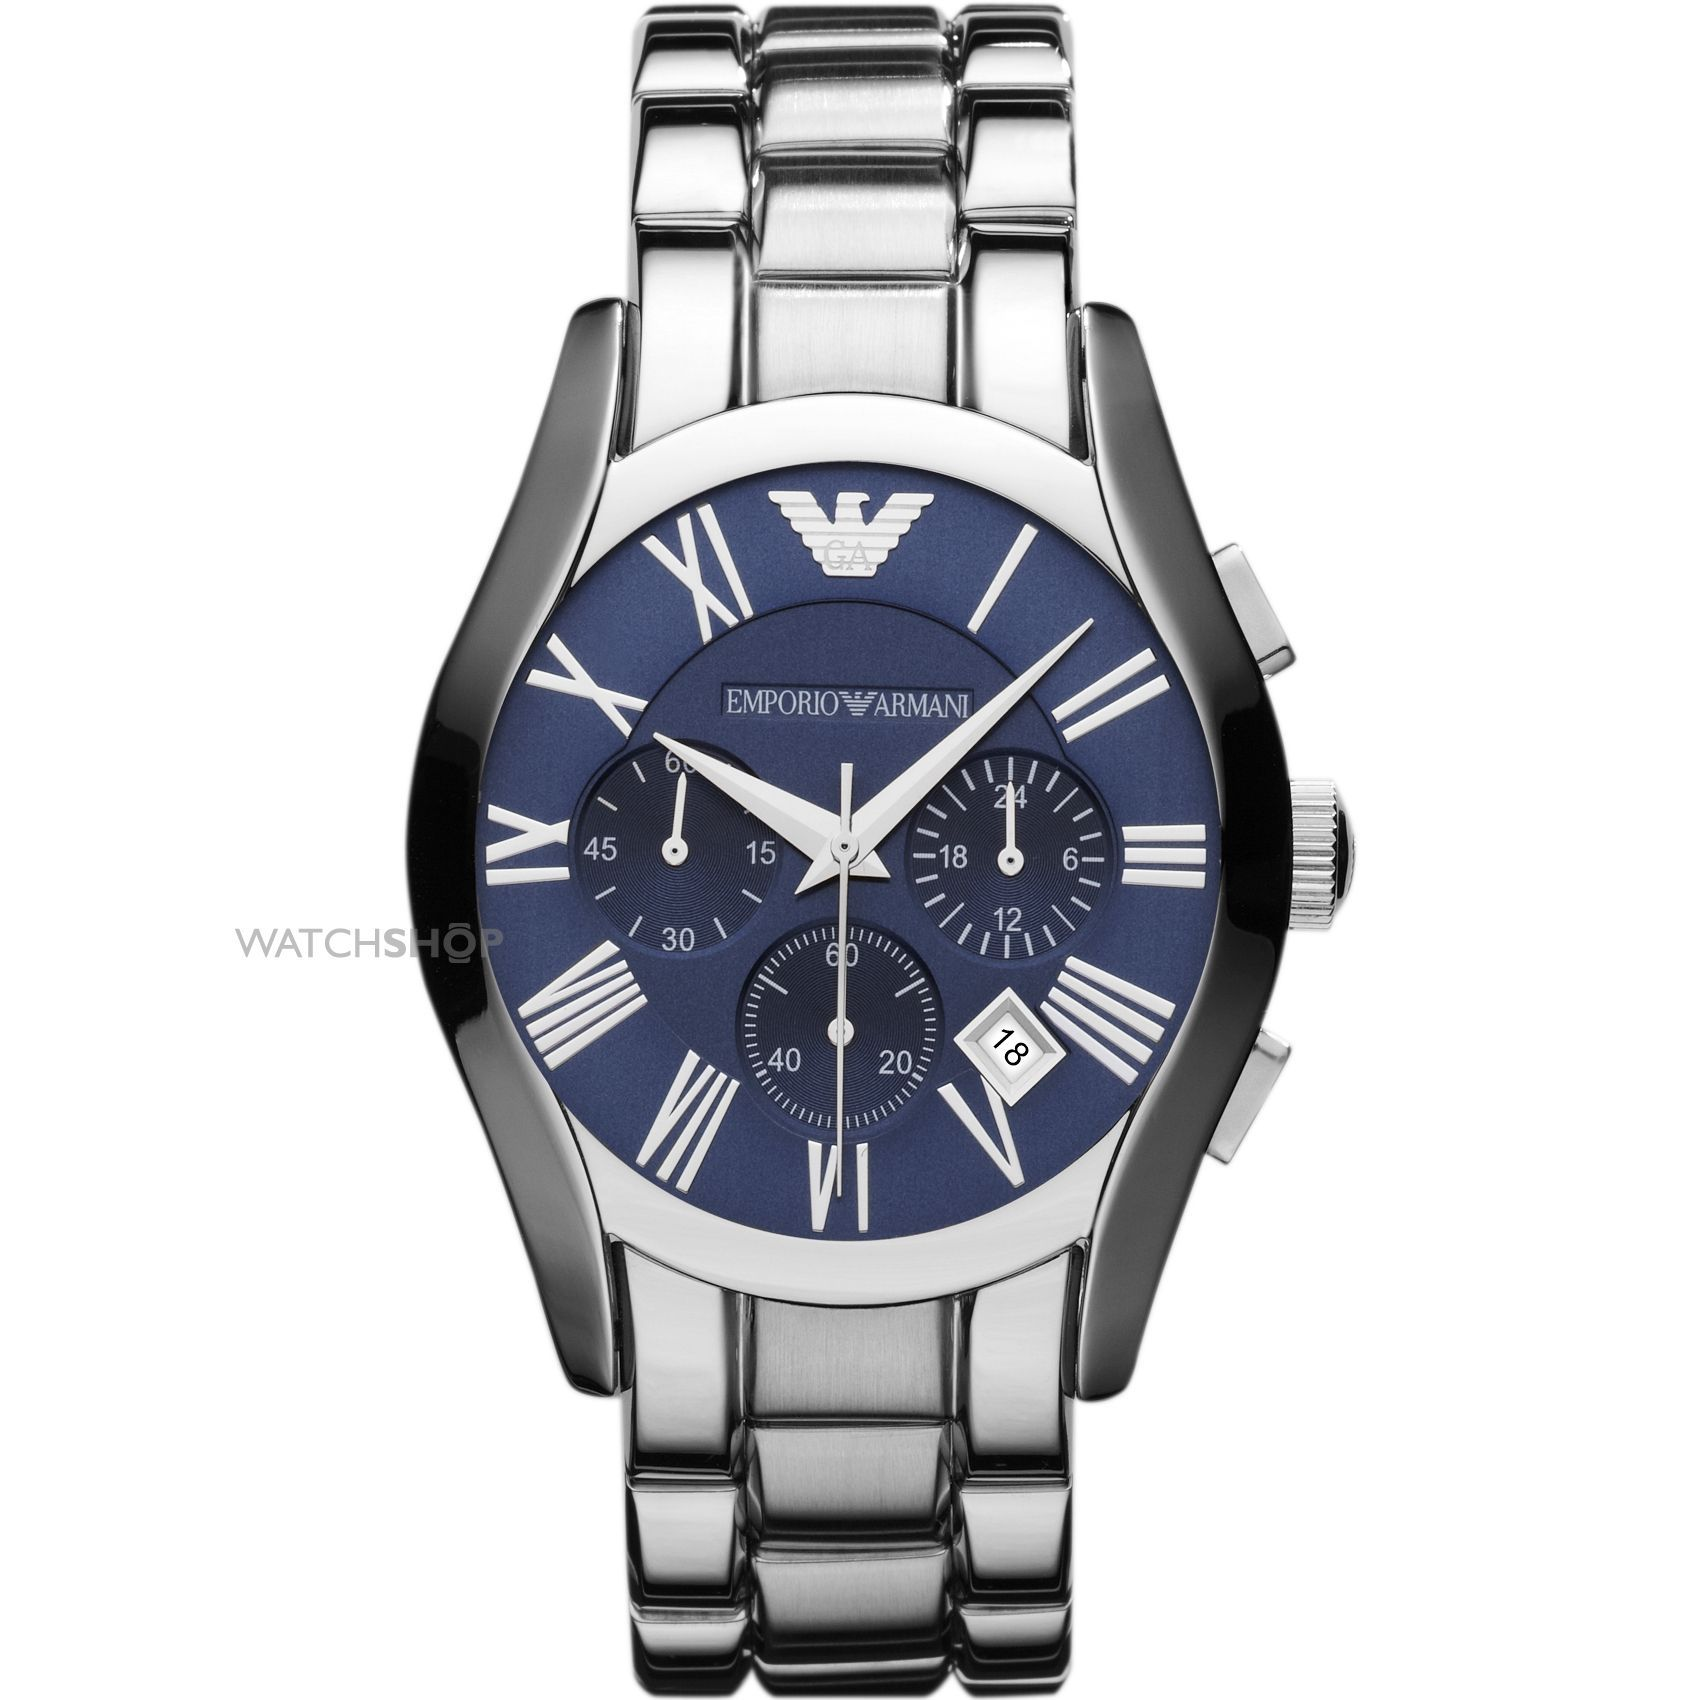 Armani Watch Model: AR1635 | Armani Watches | Pinterest ...